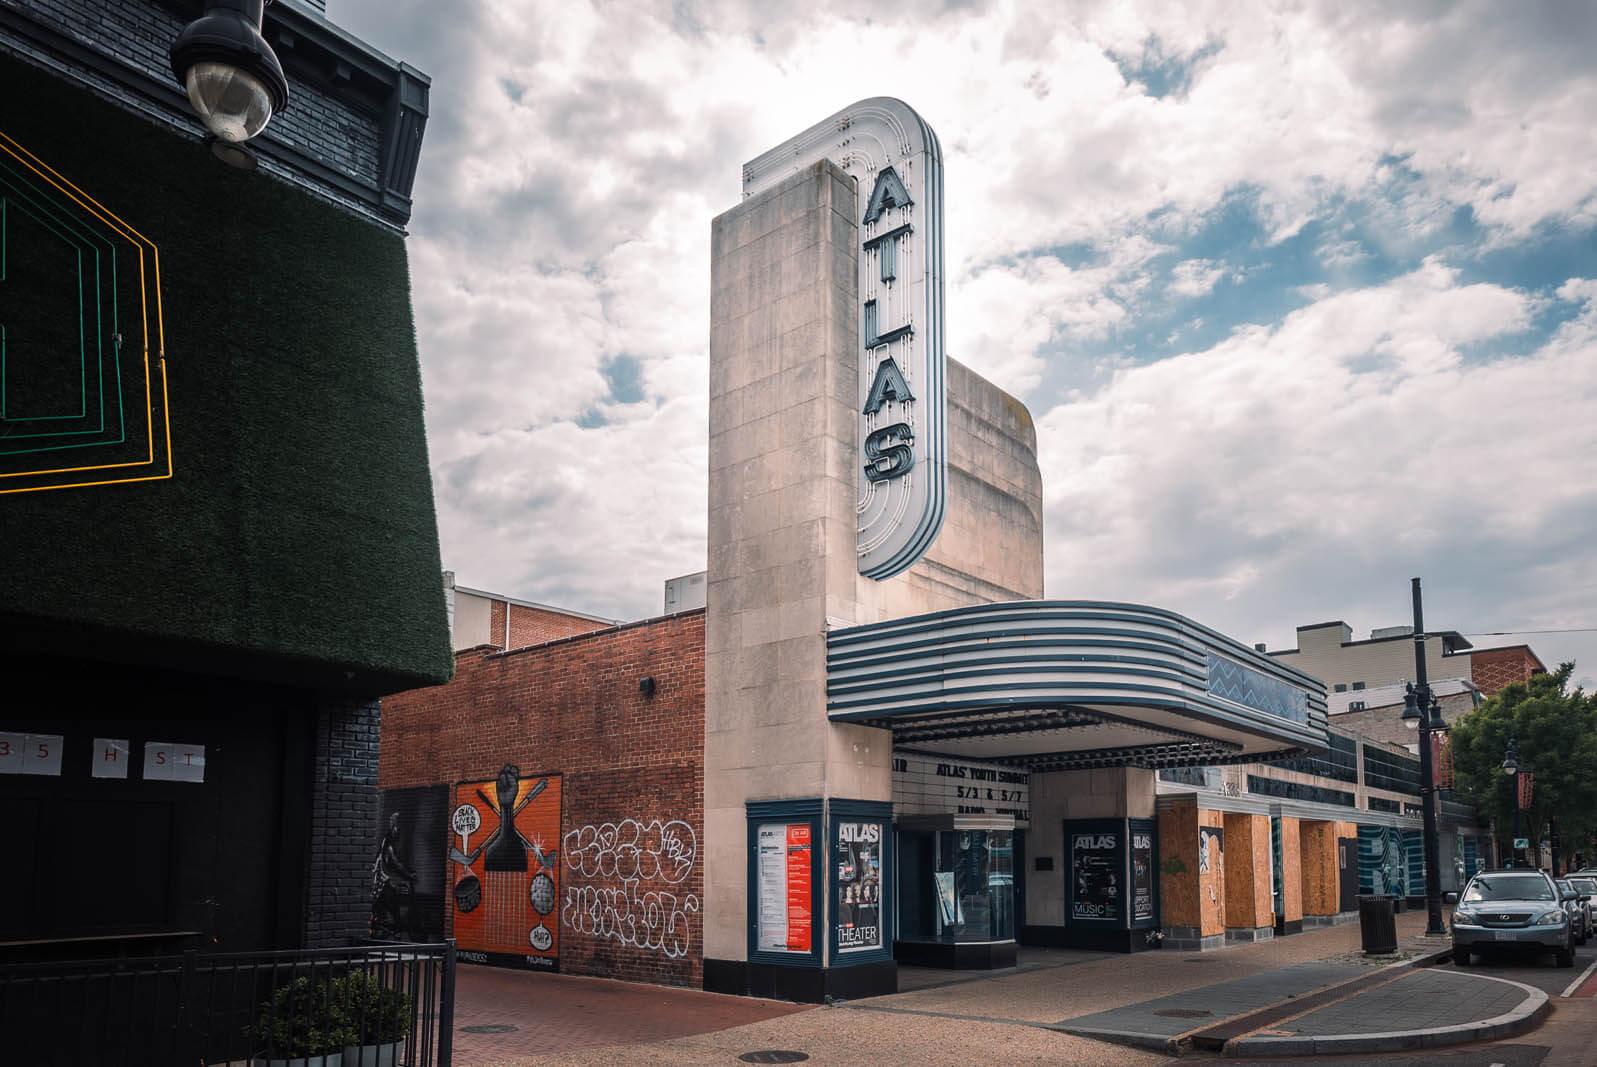 Atlas Theater in H Street Corridor in Washington DC